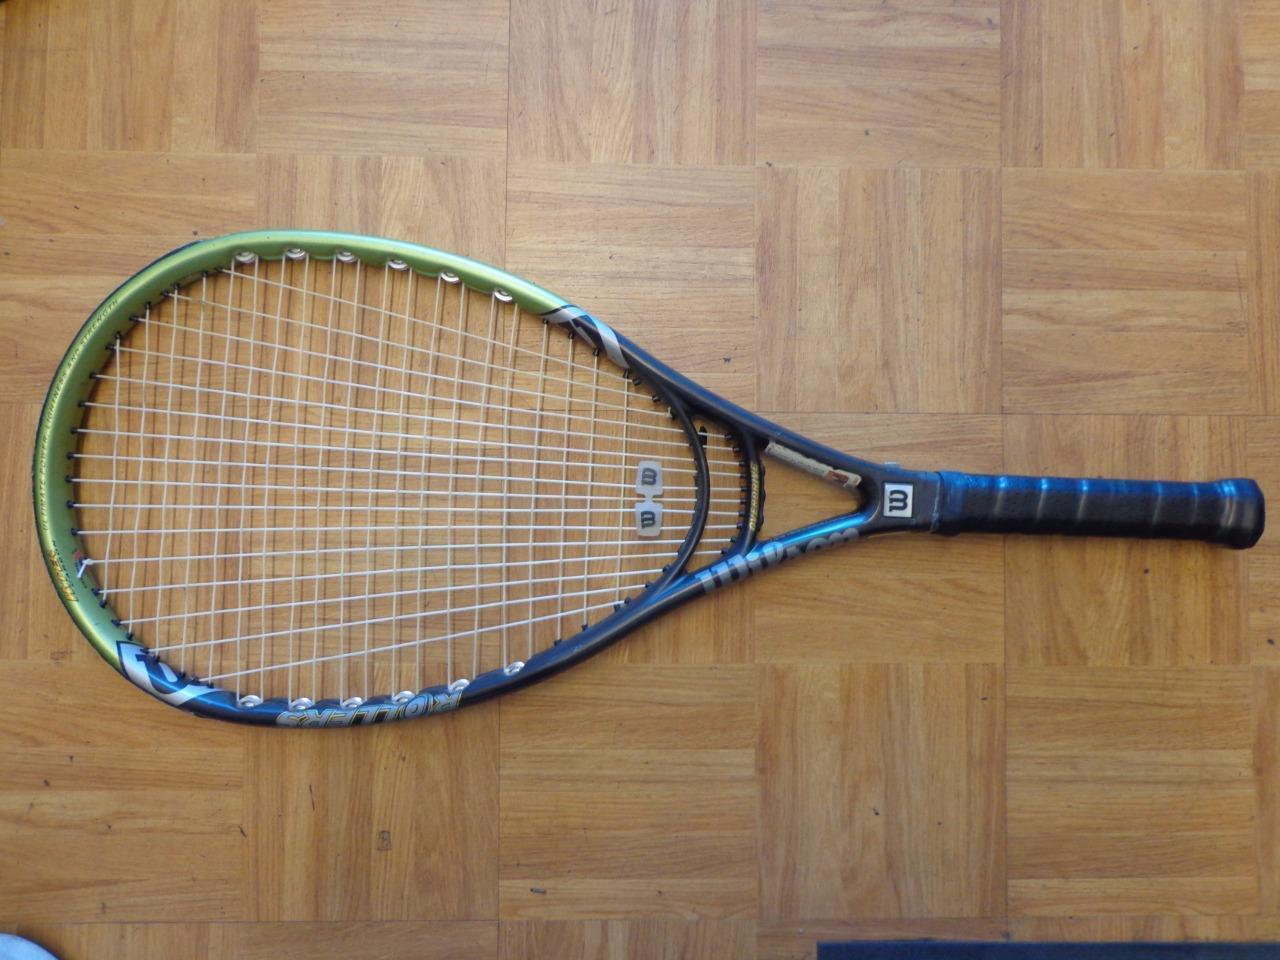 Wilson Hyper Hammer 2.6 rodillos 115 cabeza 4 3 8 Grip Tenis Raqueta